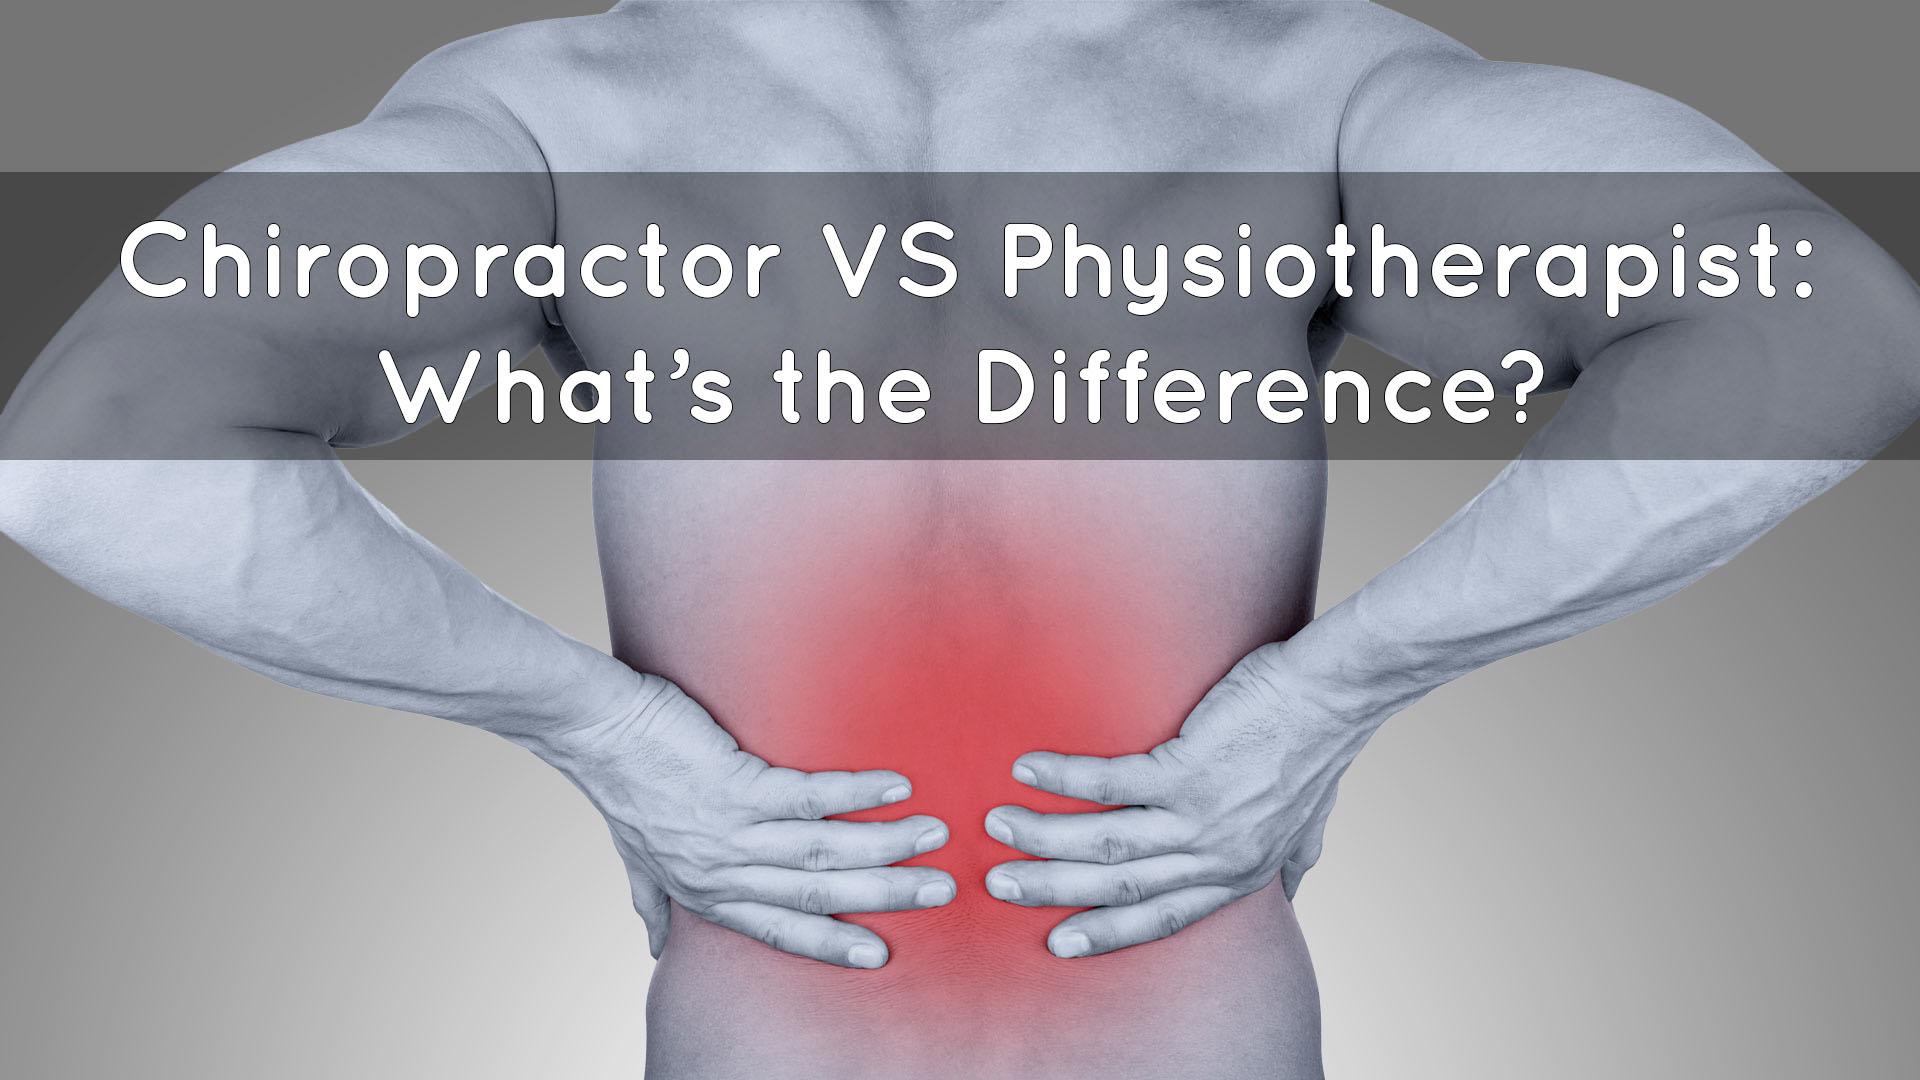 Chiropractor VS Physiotherapist Banner